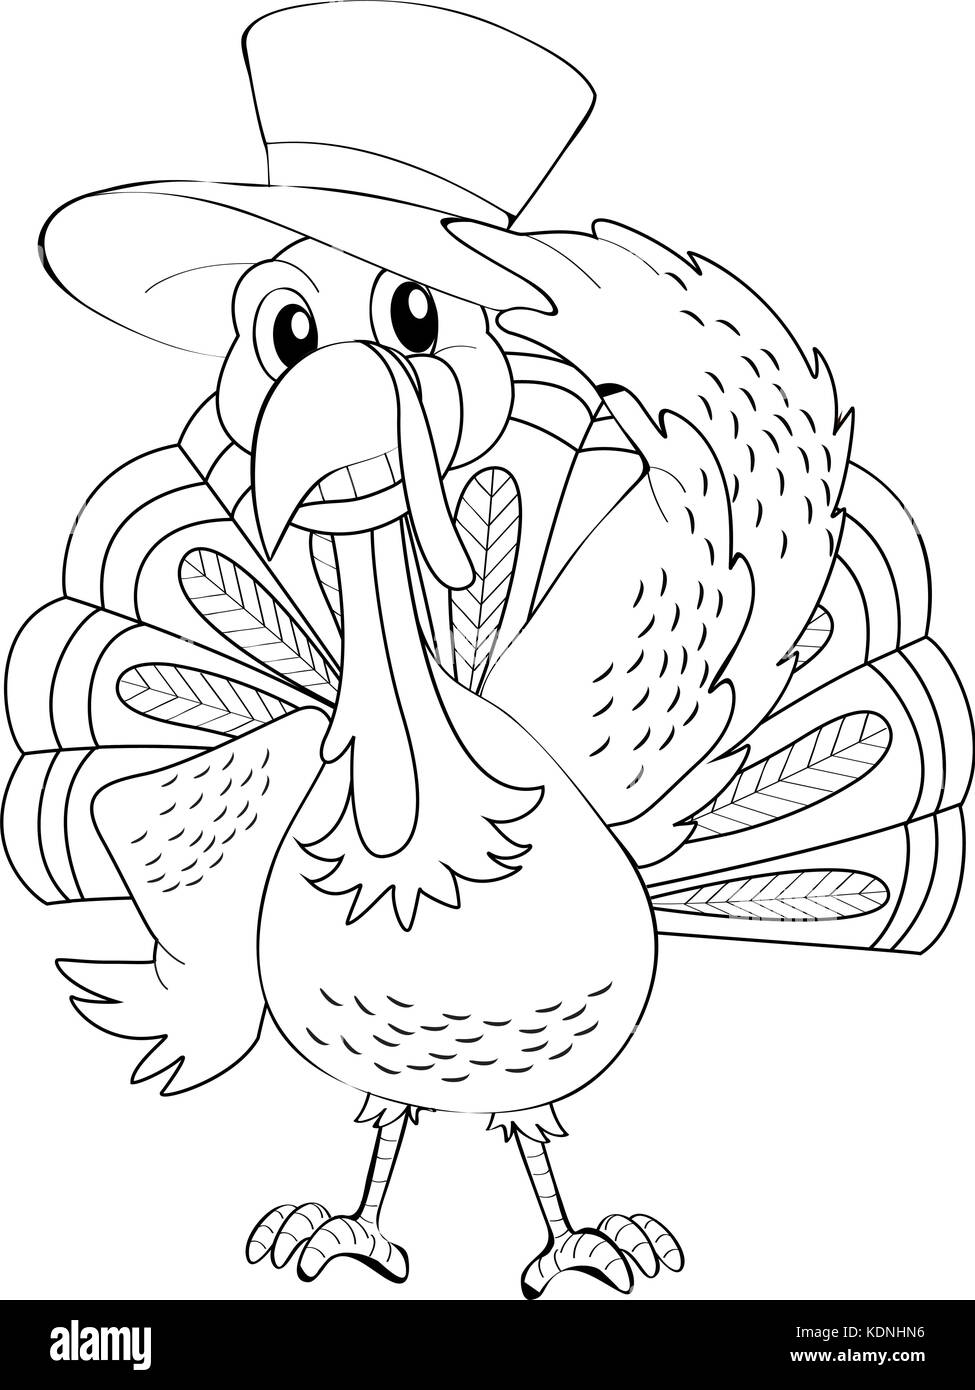 Animal outline for wild turkey illustration Stock Vector